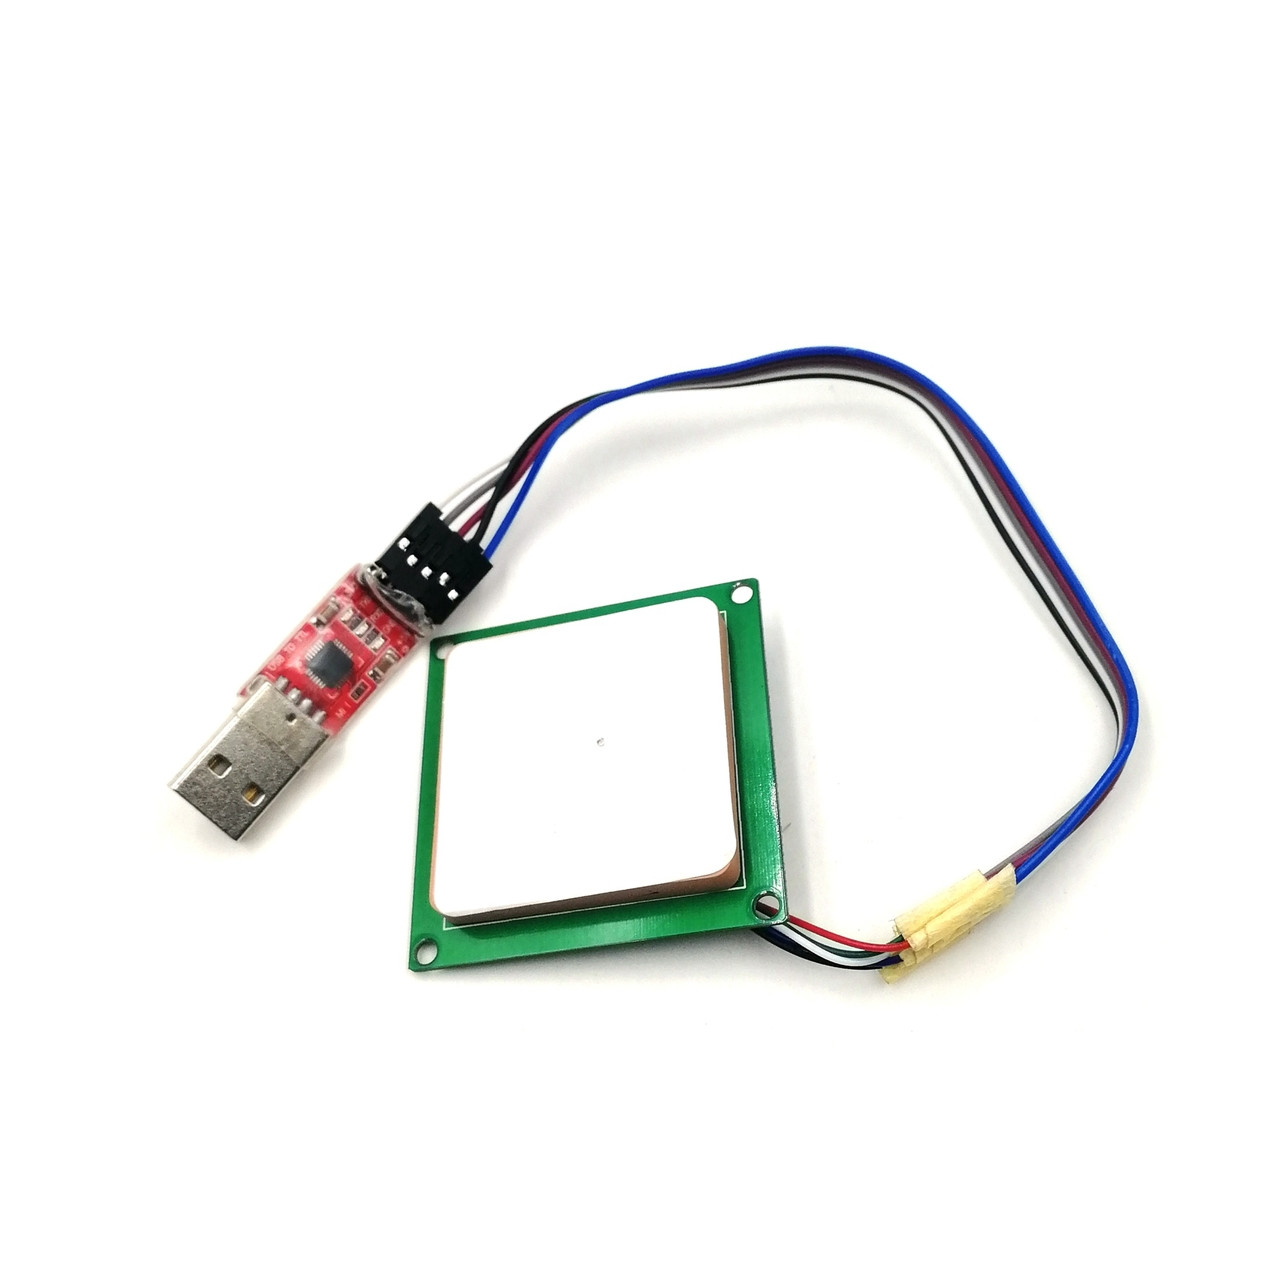 ISO18000 UHF USB Desktop Reader writer FCC 902-928MHz 865-868MHz RFID CardReader